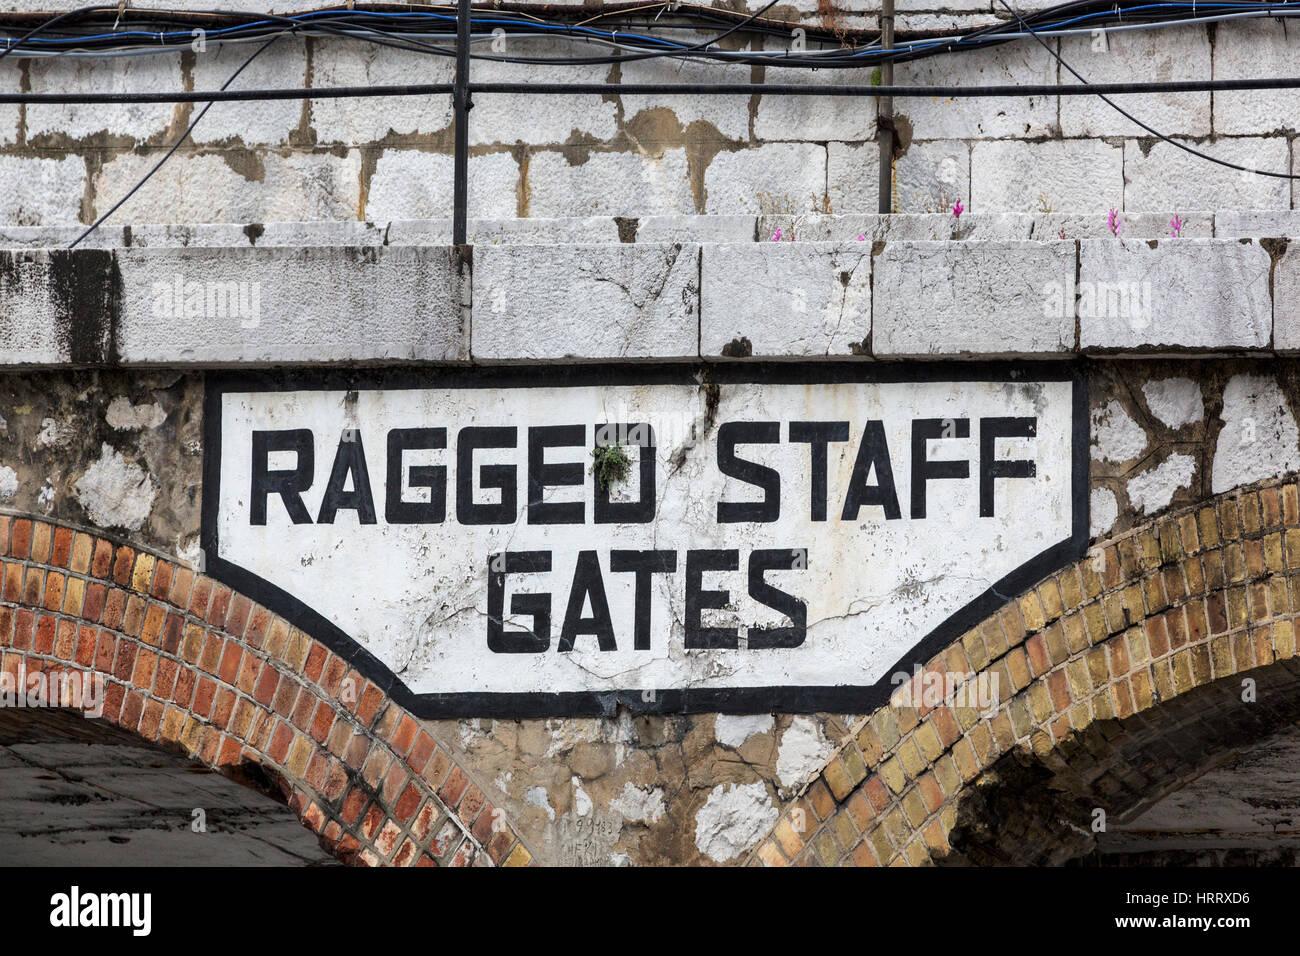 Ragged Staff Gates - Stock Image